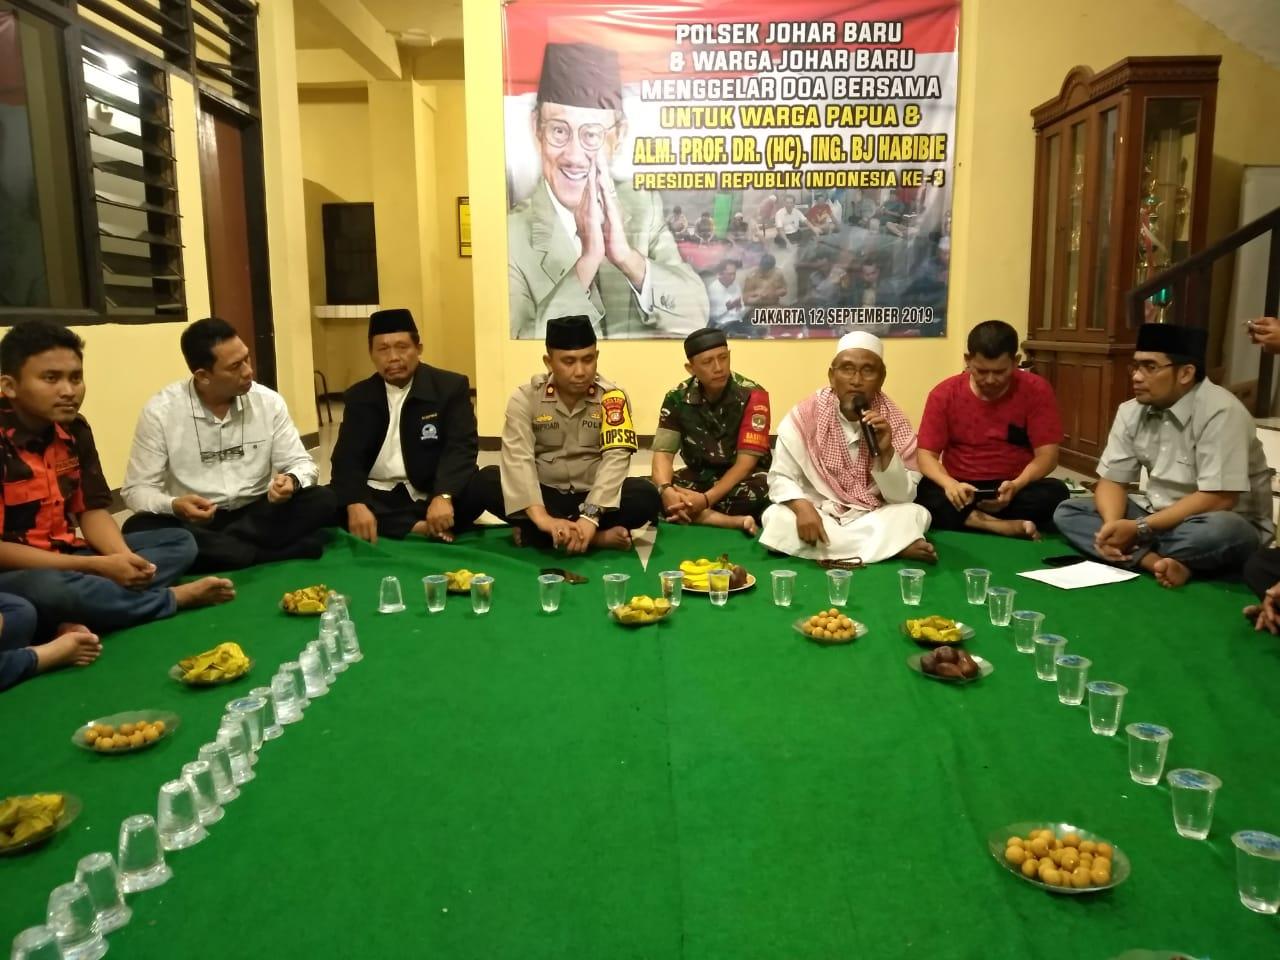 Polsek Johar Baru Dan Warga Gelar Doa Bersama untuk Papua Dan Alm. BJ.Habibie